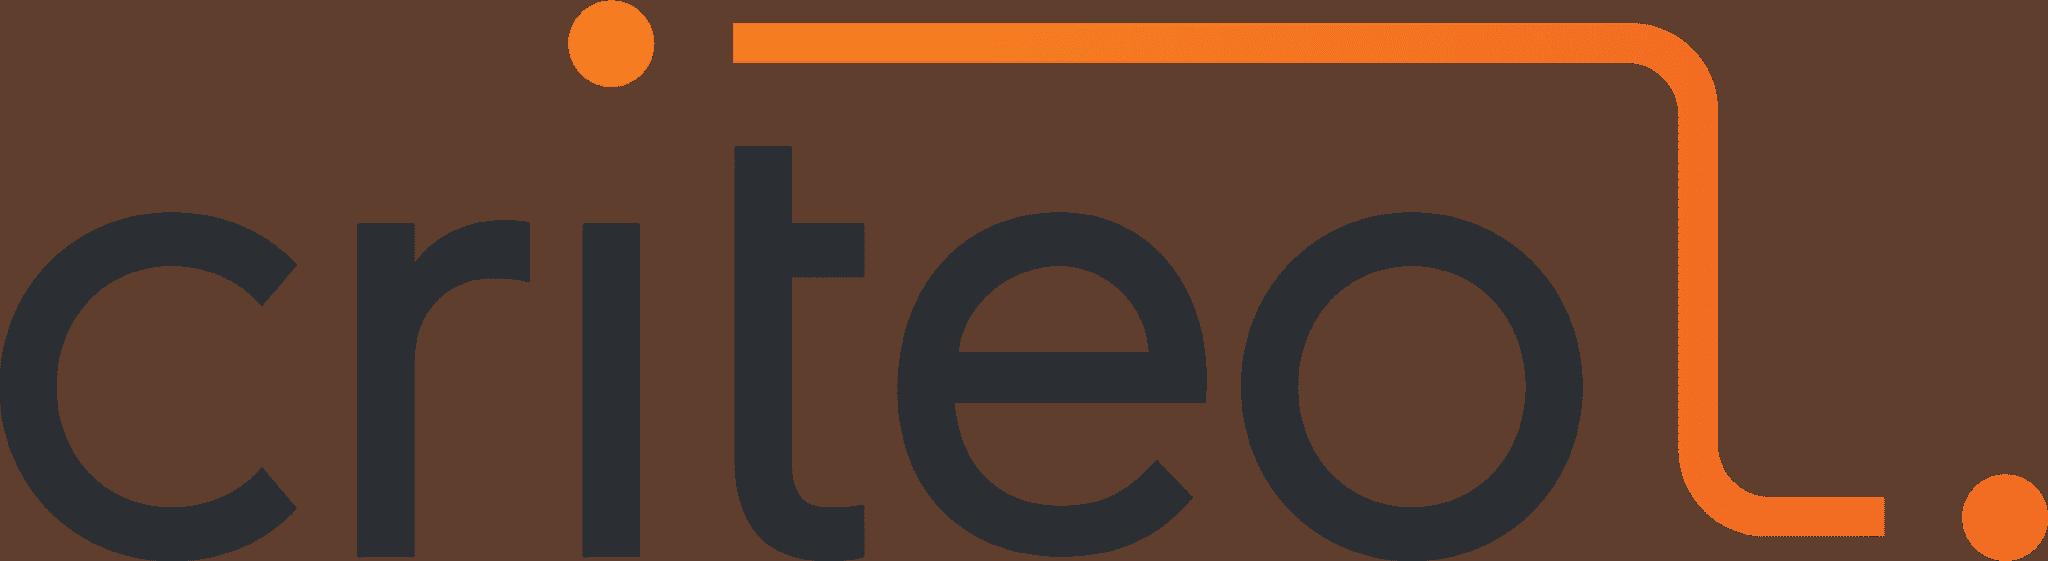 18_Criteo_Brand_Logo_Digital (2)